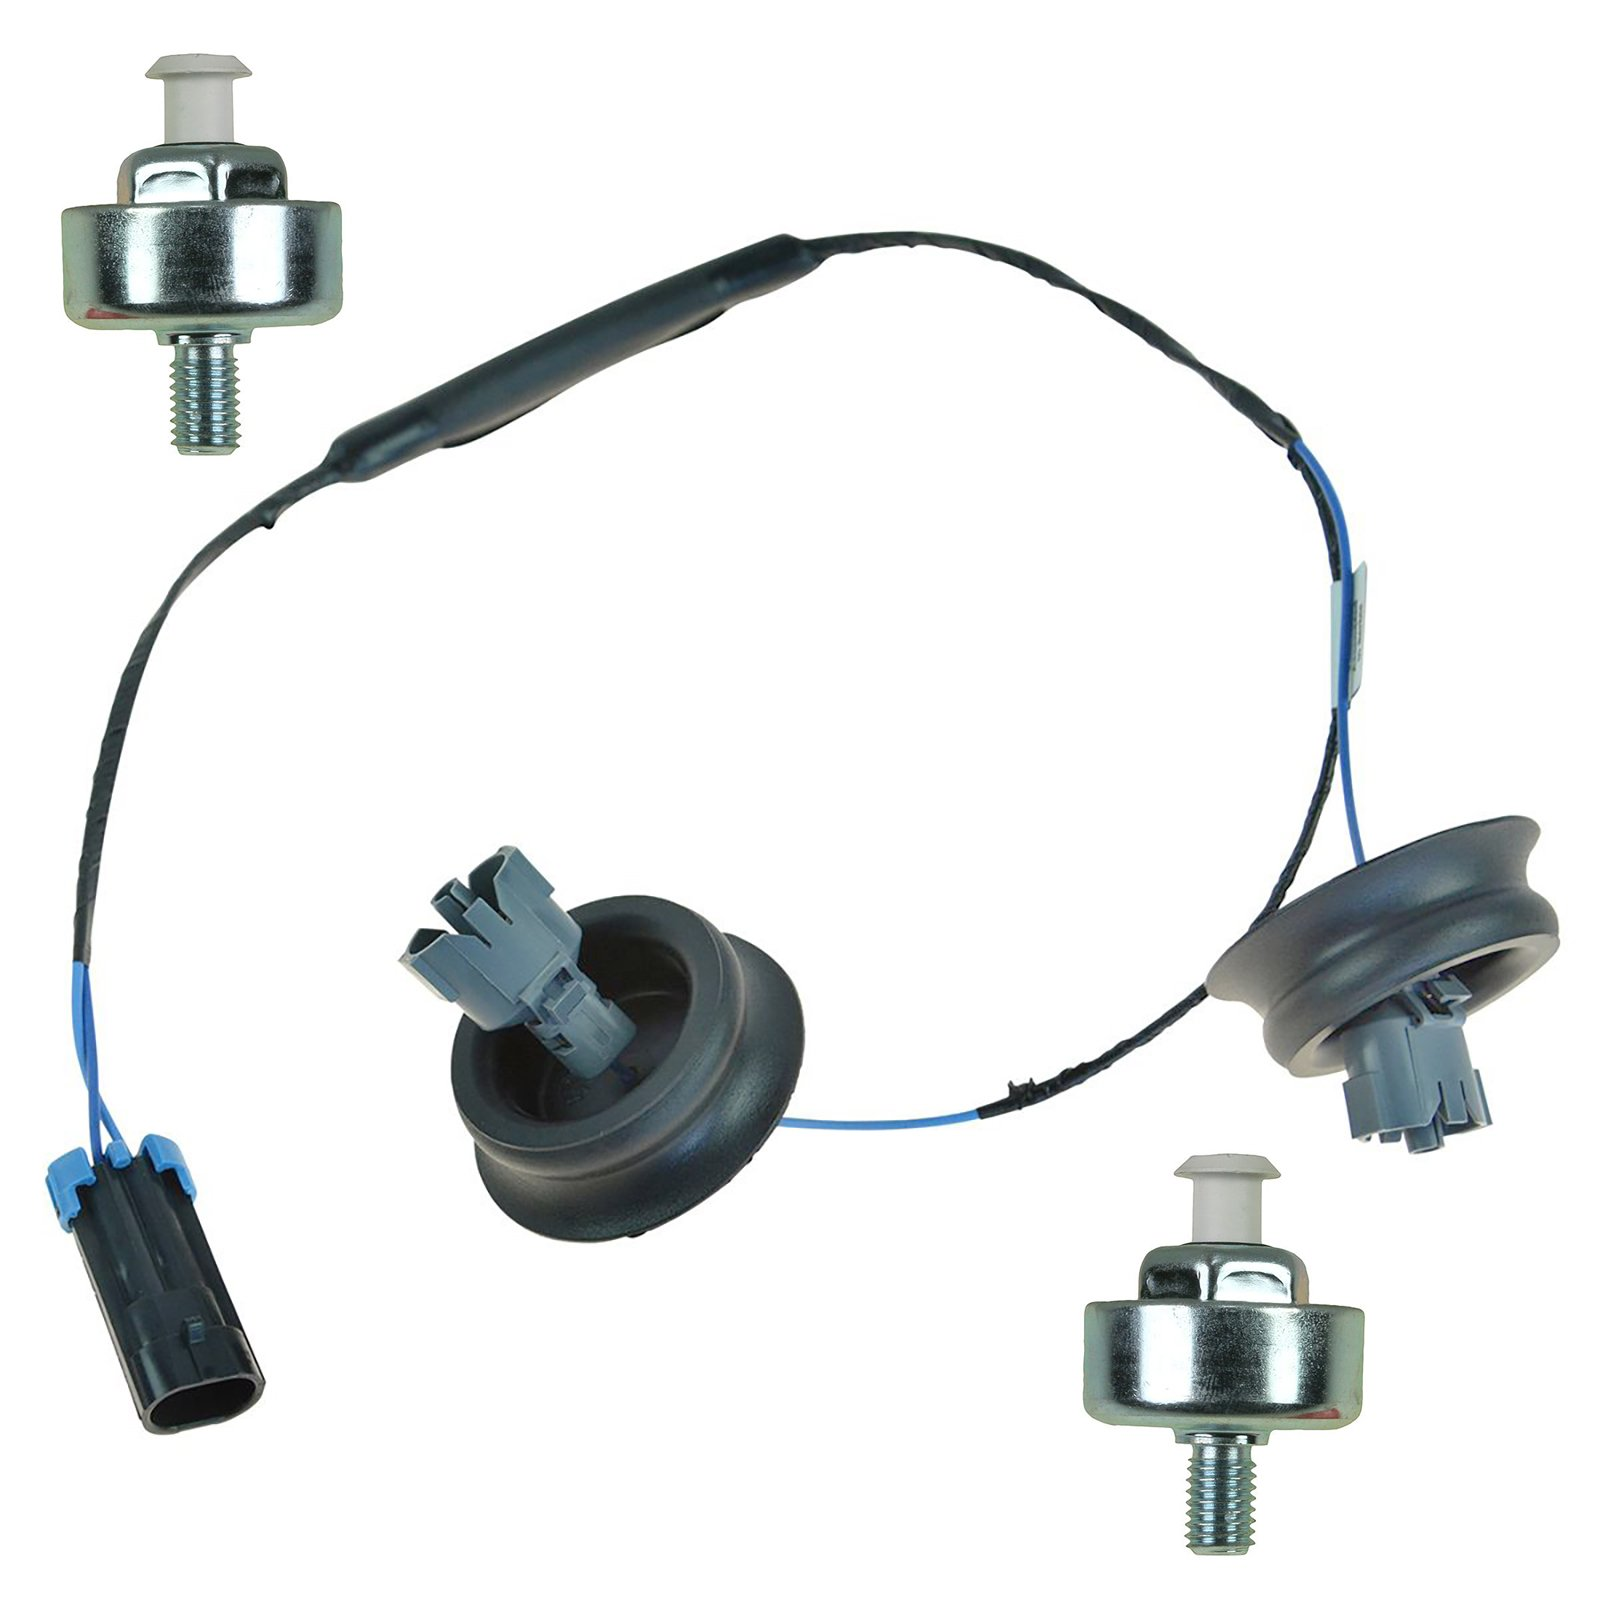 GM ACDelco Knock Sensor Harness Kit Set 3pc 12601822, 213-3521 by 1A Auto